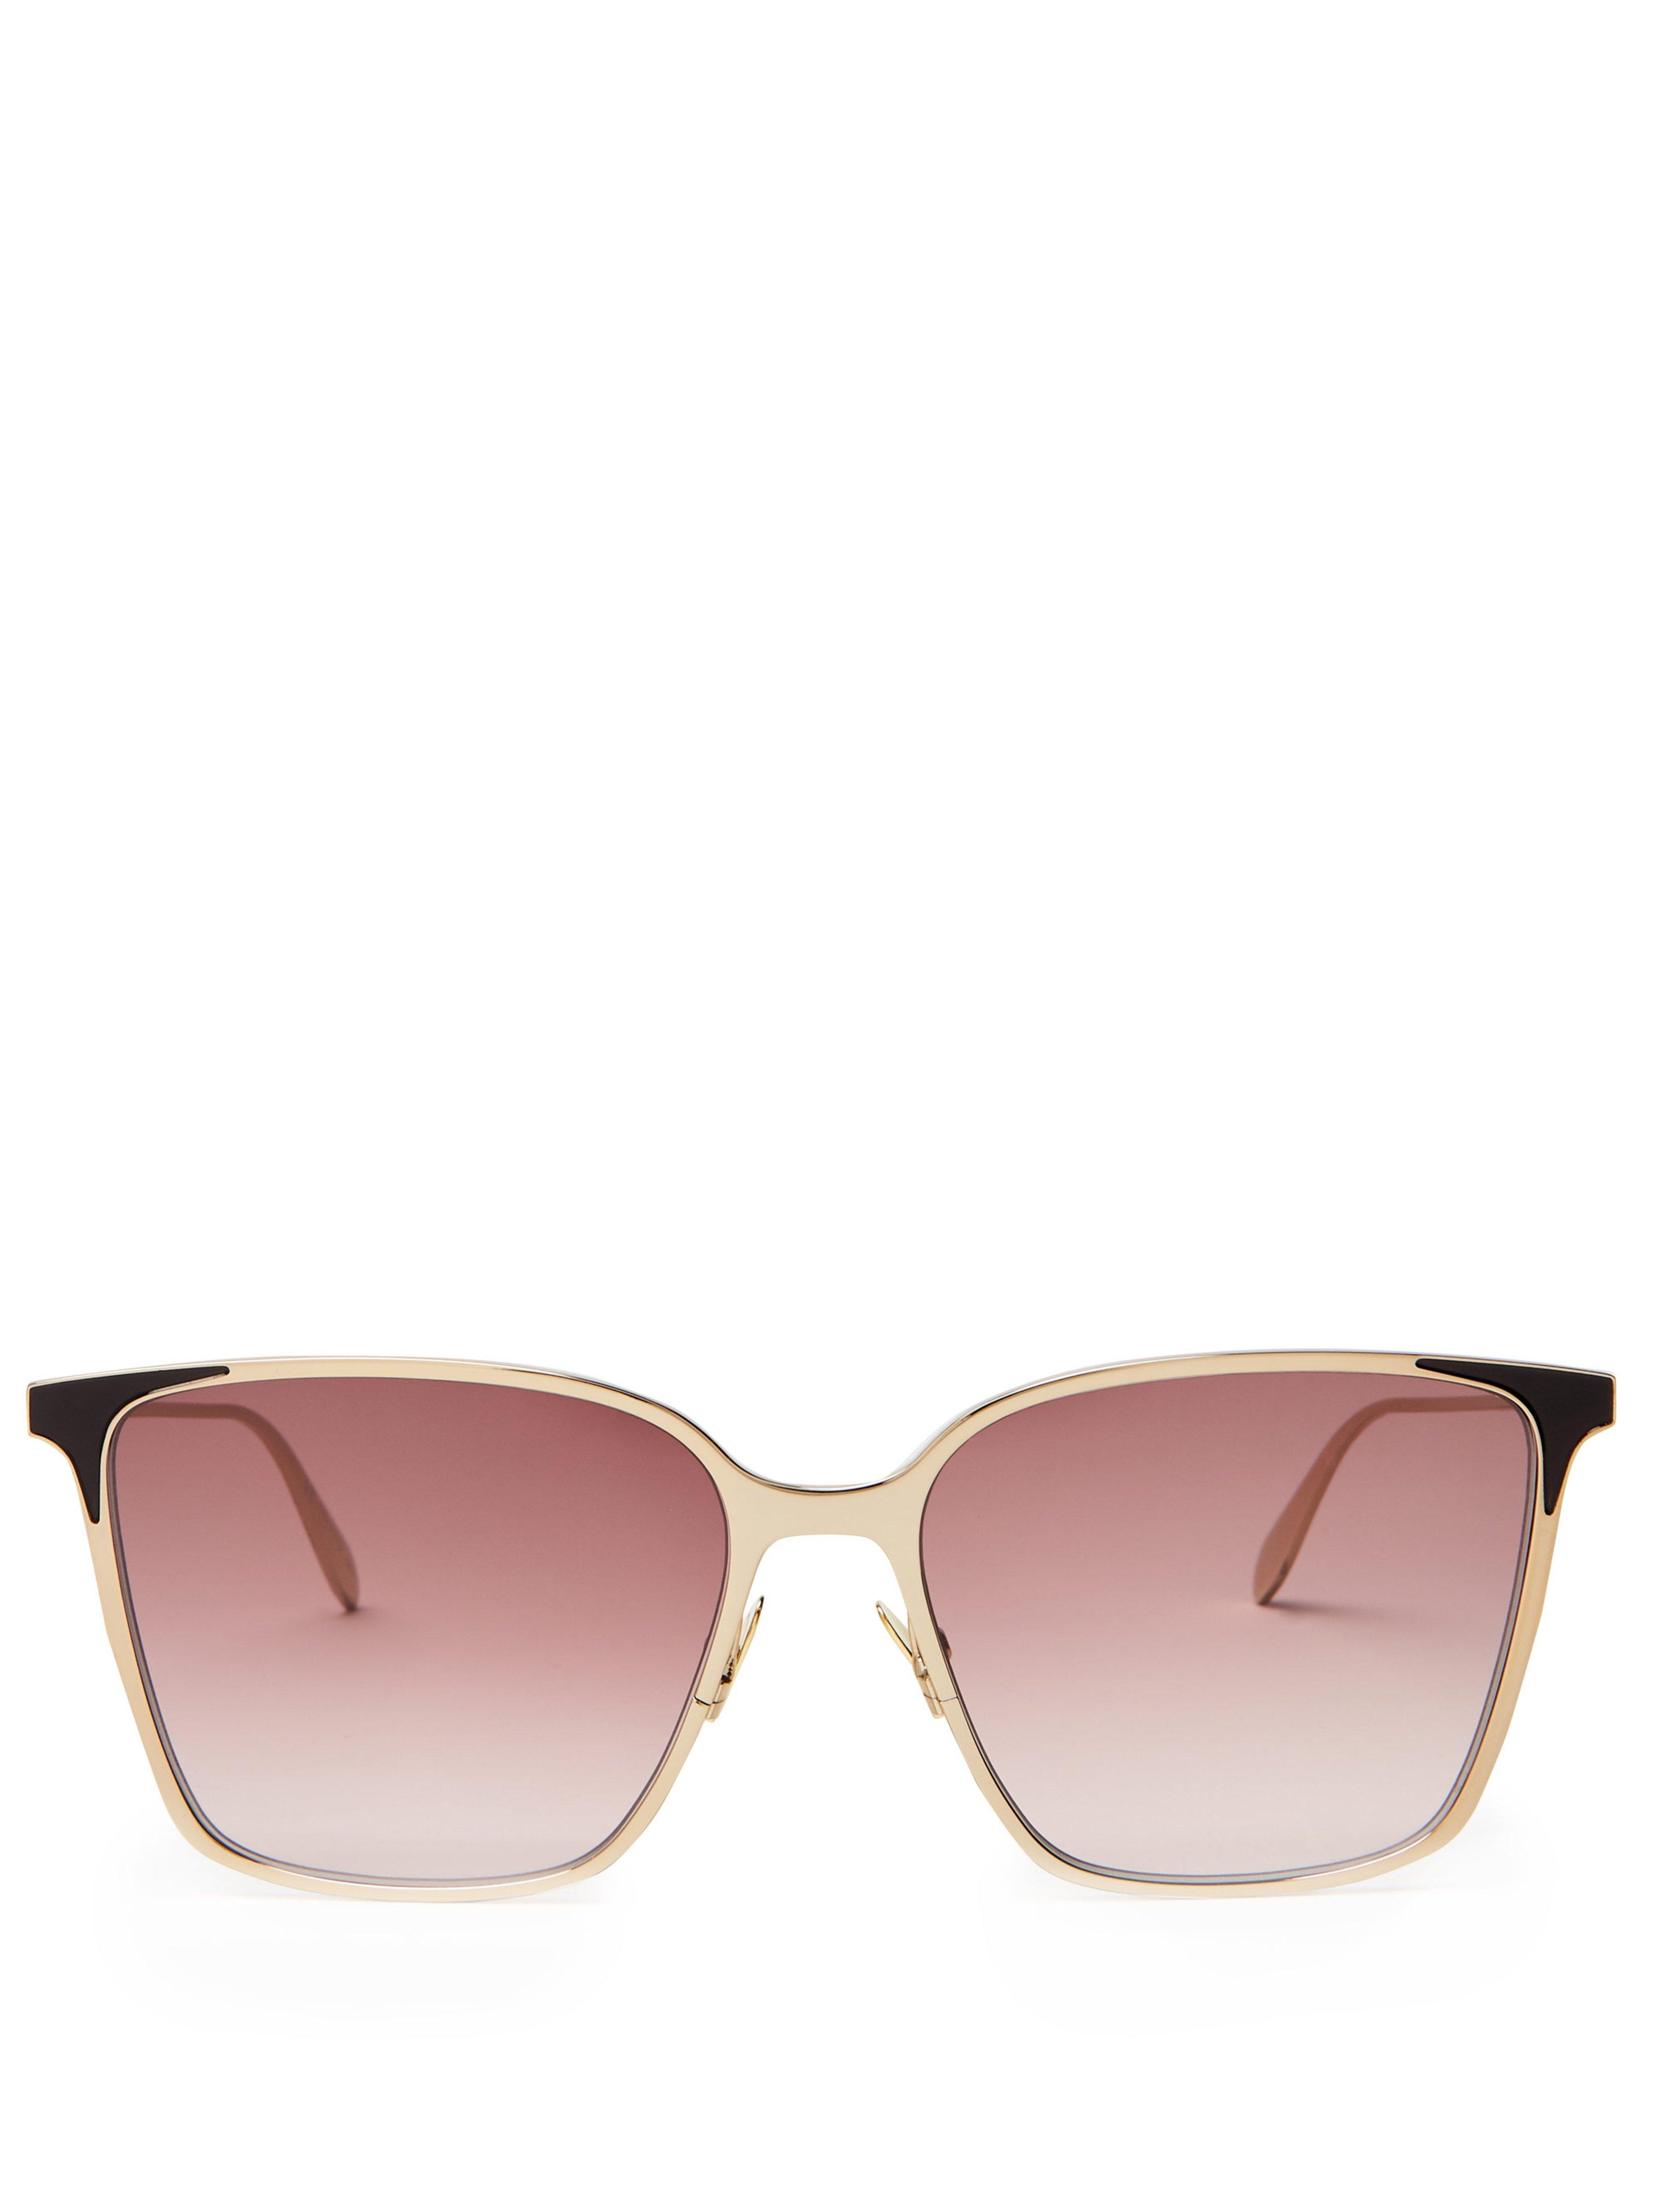 1a9471f4146 Alexander McQueen Square Frame Metal Sunglasses in Metallic for Men ...